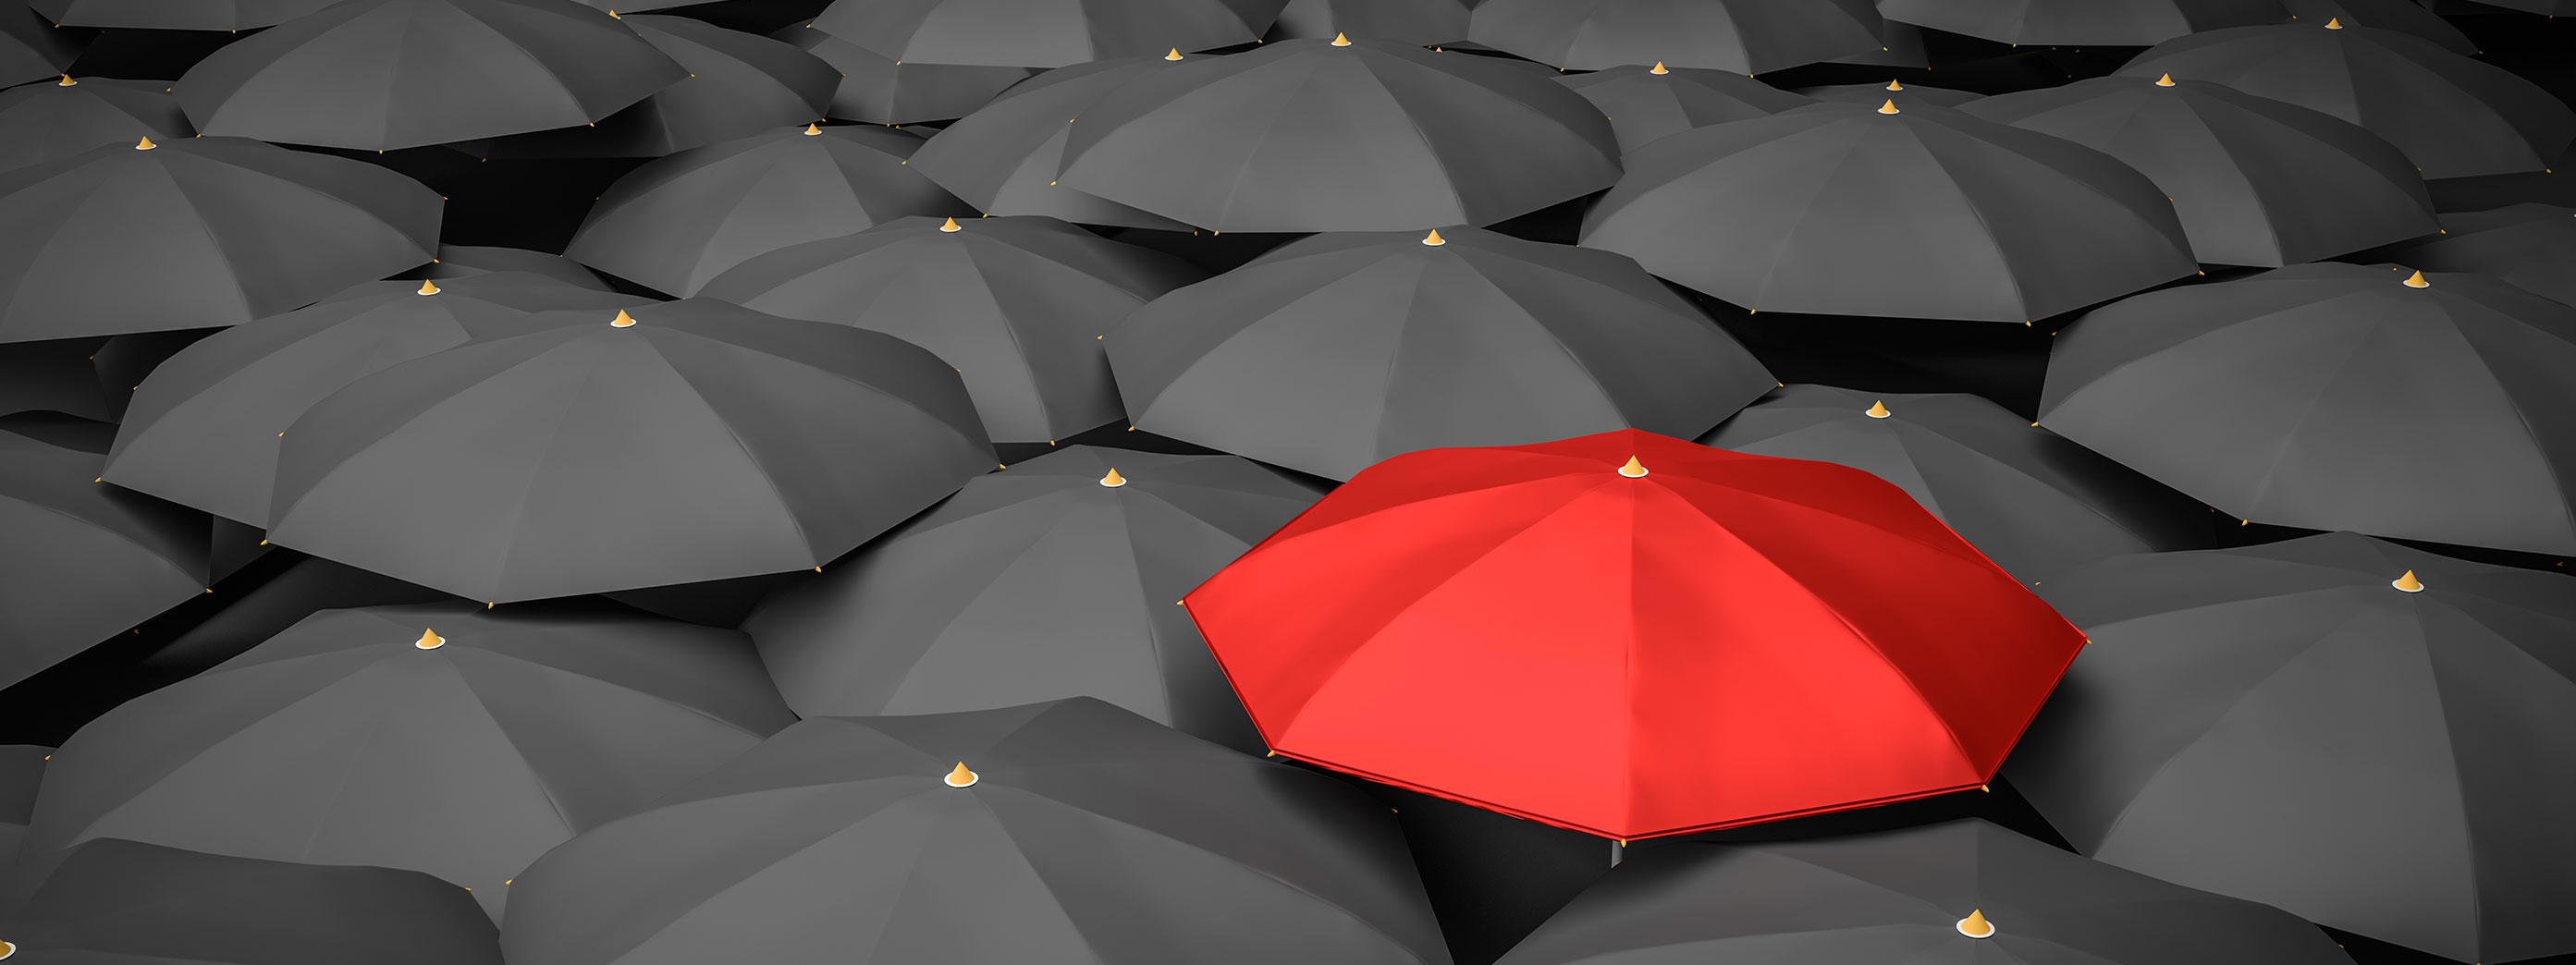 one red umbrella in a sea of black umbrellas